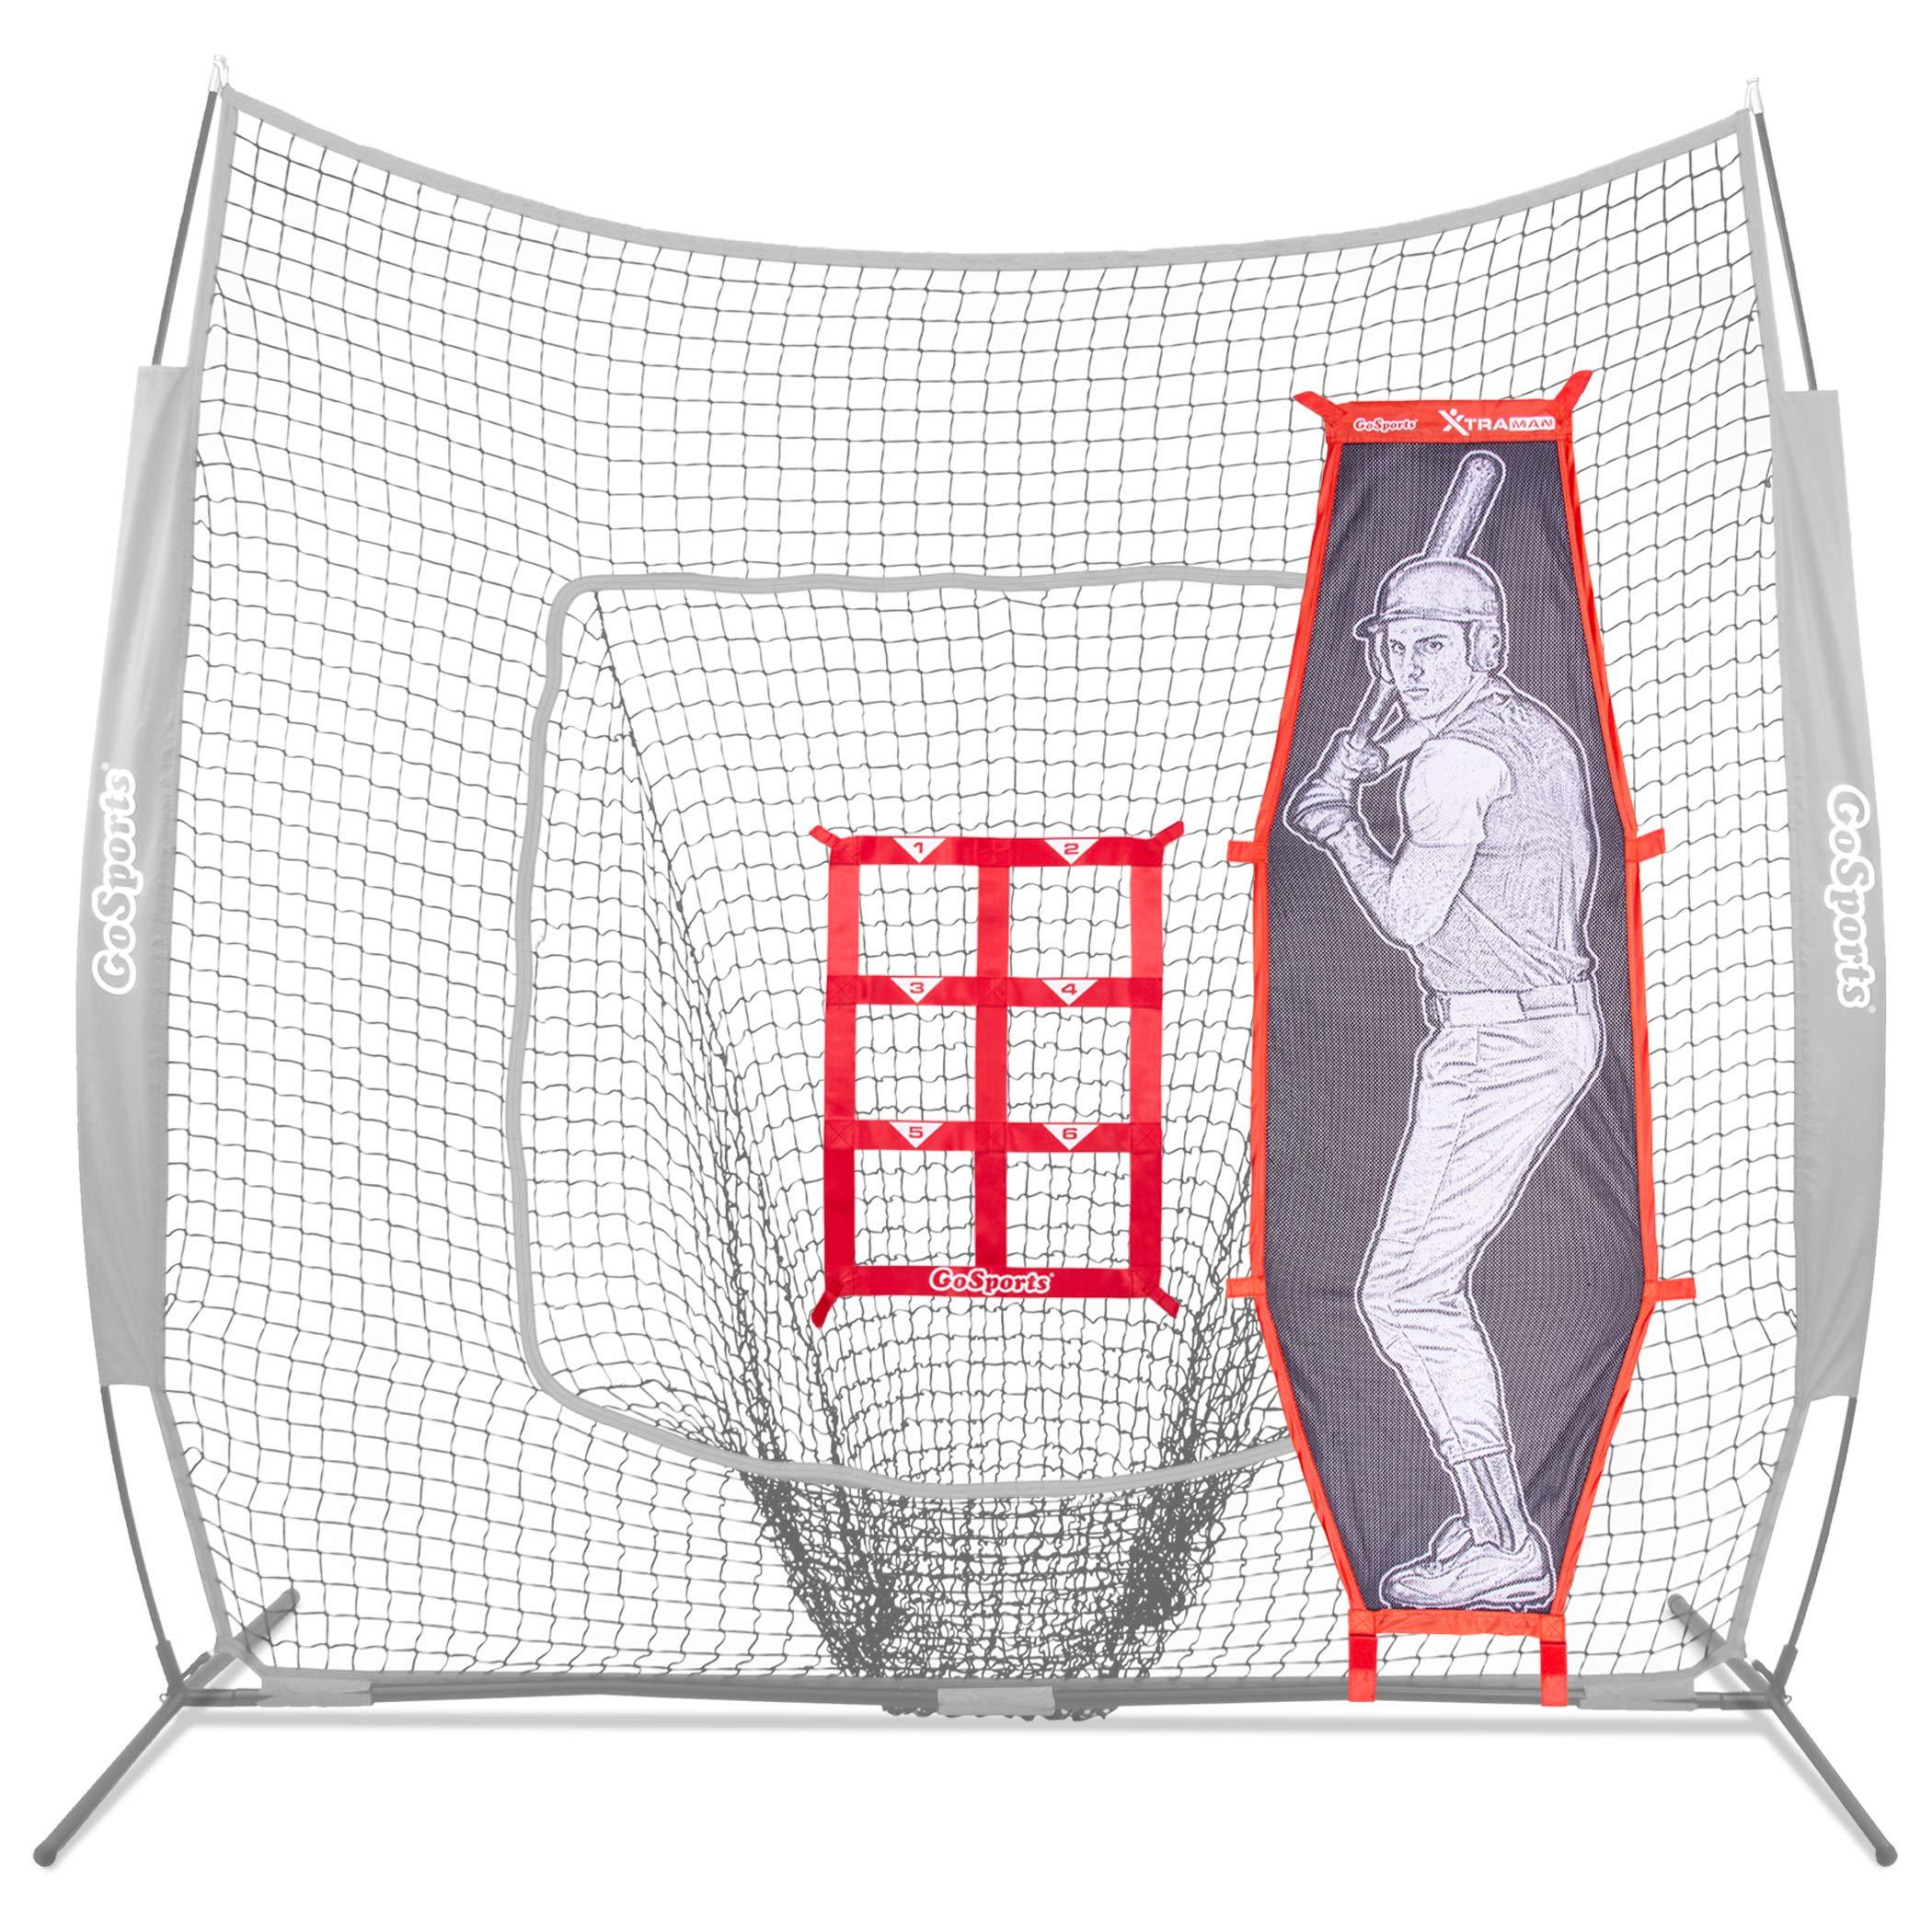 GoSports Baseball & Softball Pitching Kit | Practice Accuracy Training with Strike Zone & XTRAMAN Dummy Batter by GoSports